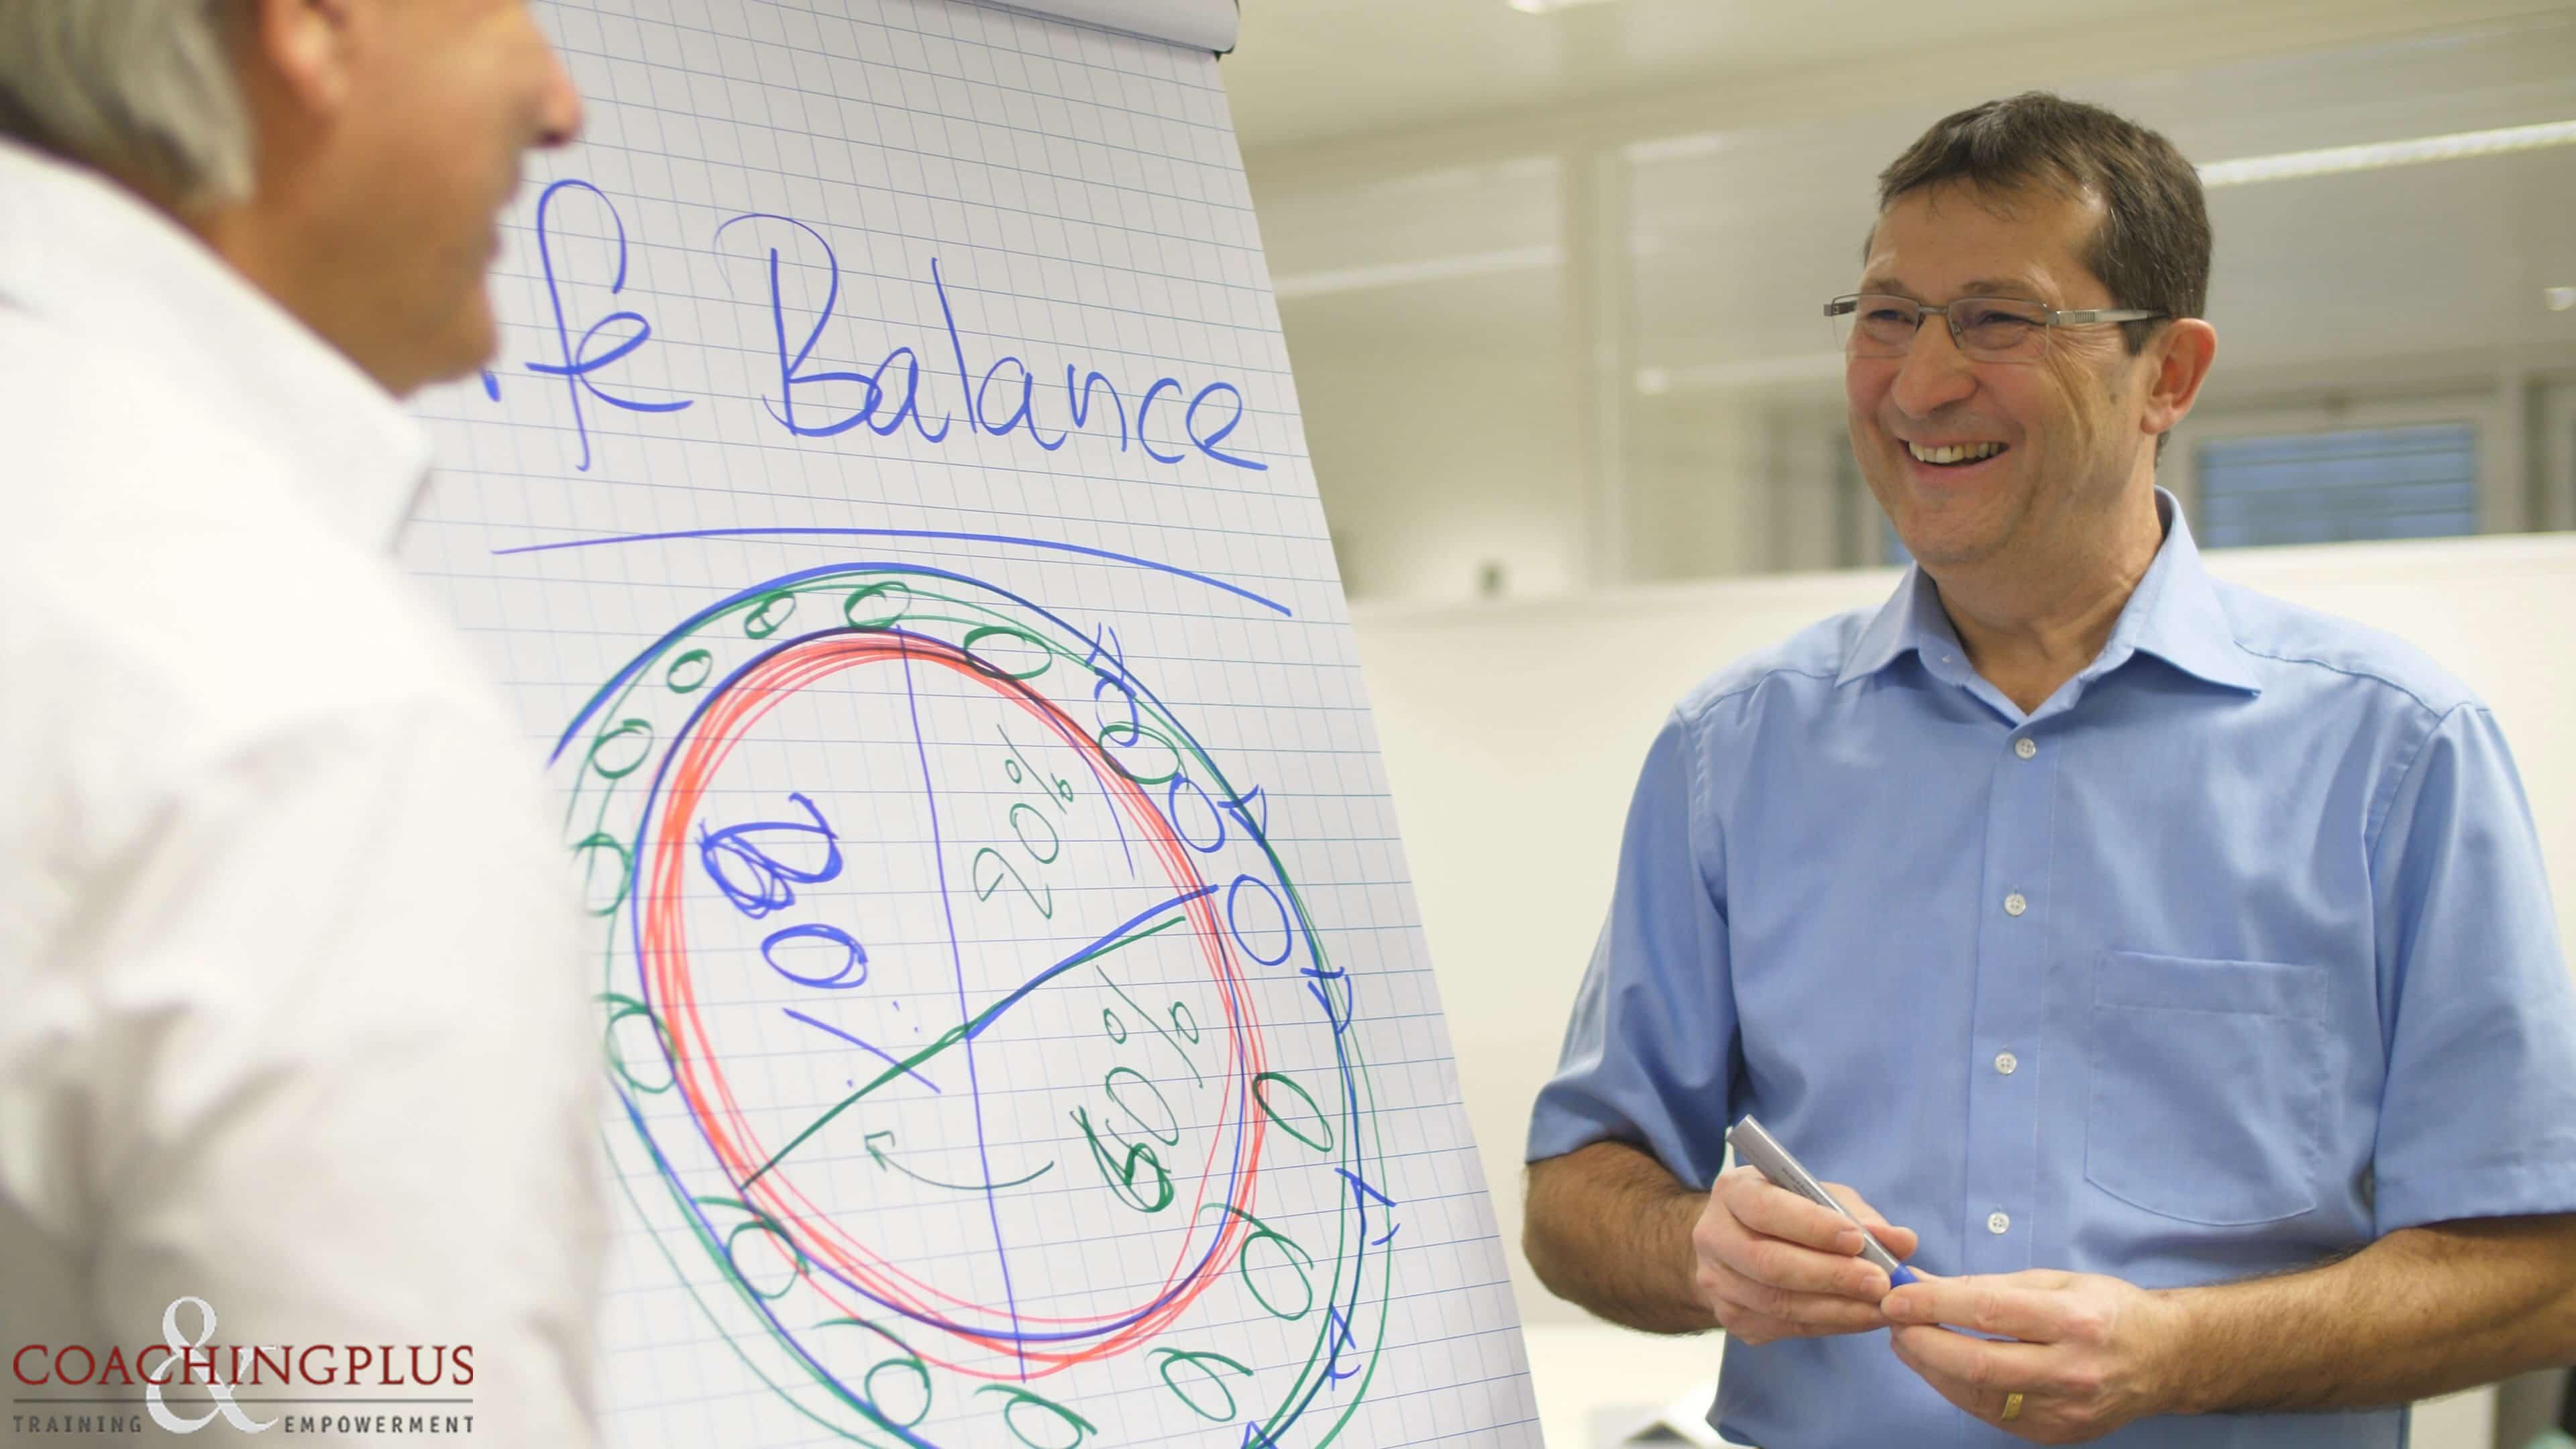 Der Coaching-Studiengang: eidg. Betrieblicher Mentor FA